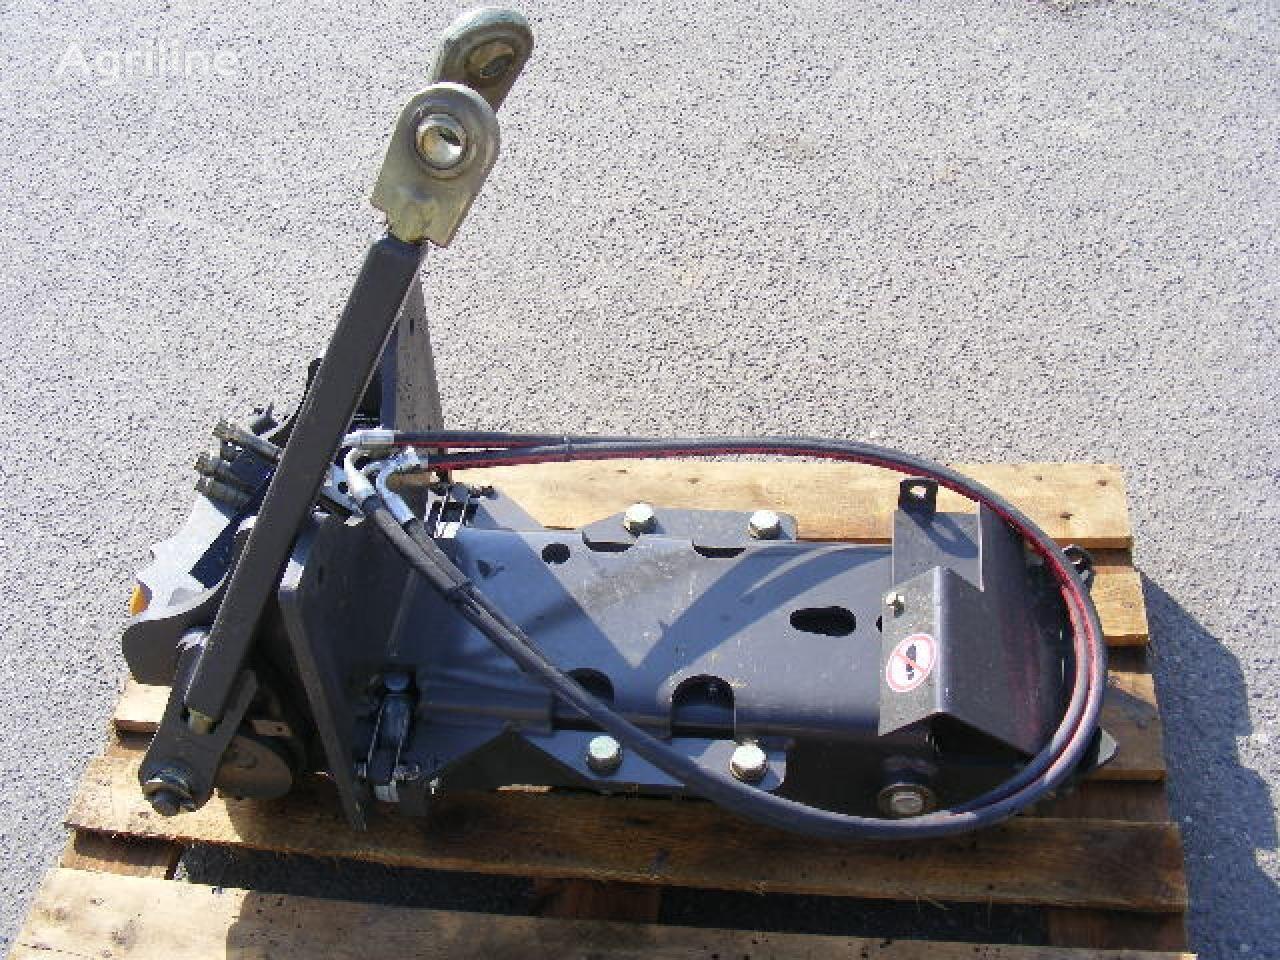 CLAAS Hitchhaken für -Schlepper enganche de remolque para CLAAS tractor